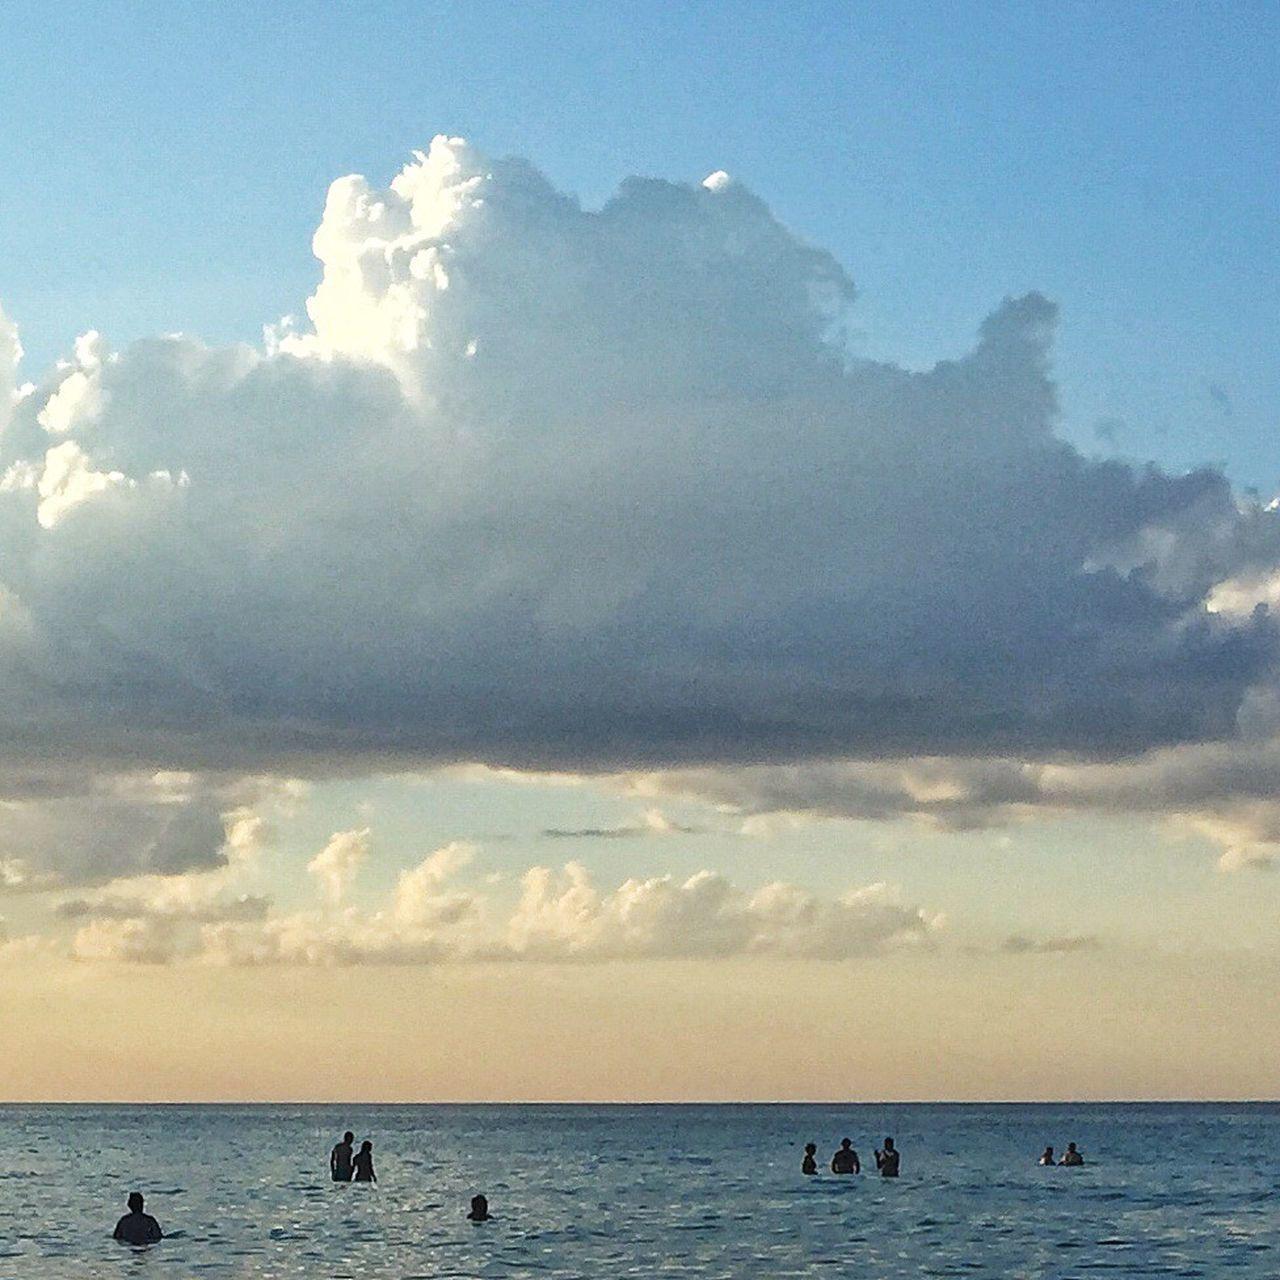 Under a cloud Minimal Minimalist Seascape Minimalobsession EyeEm Best Shots Cuba Varadero Minimallandscape